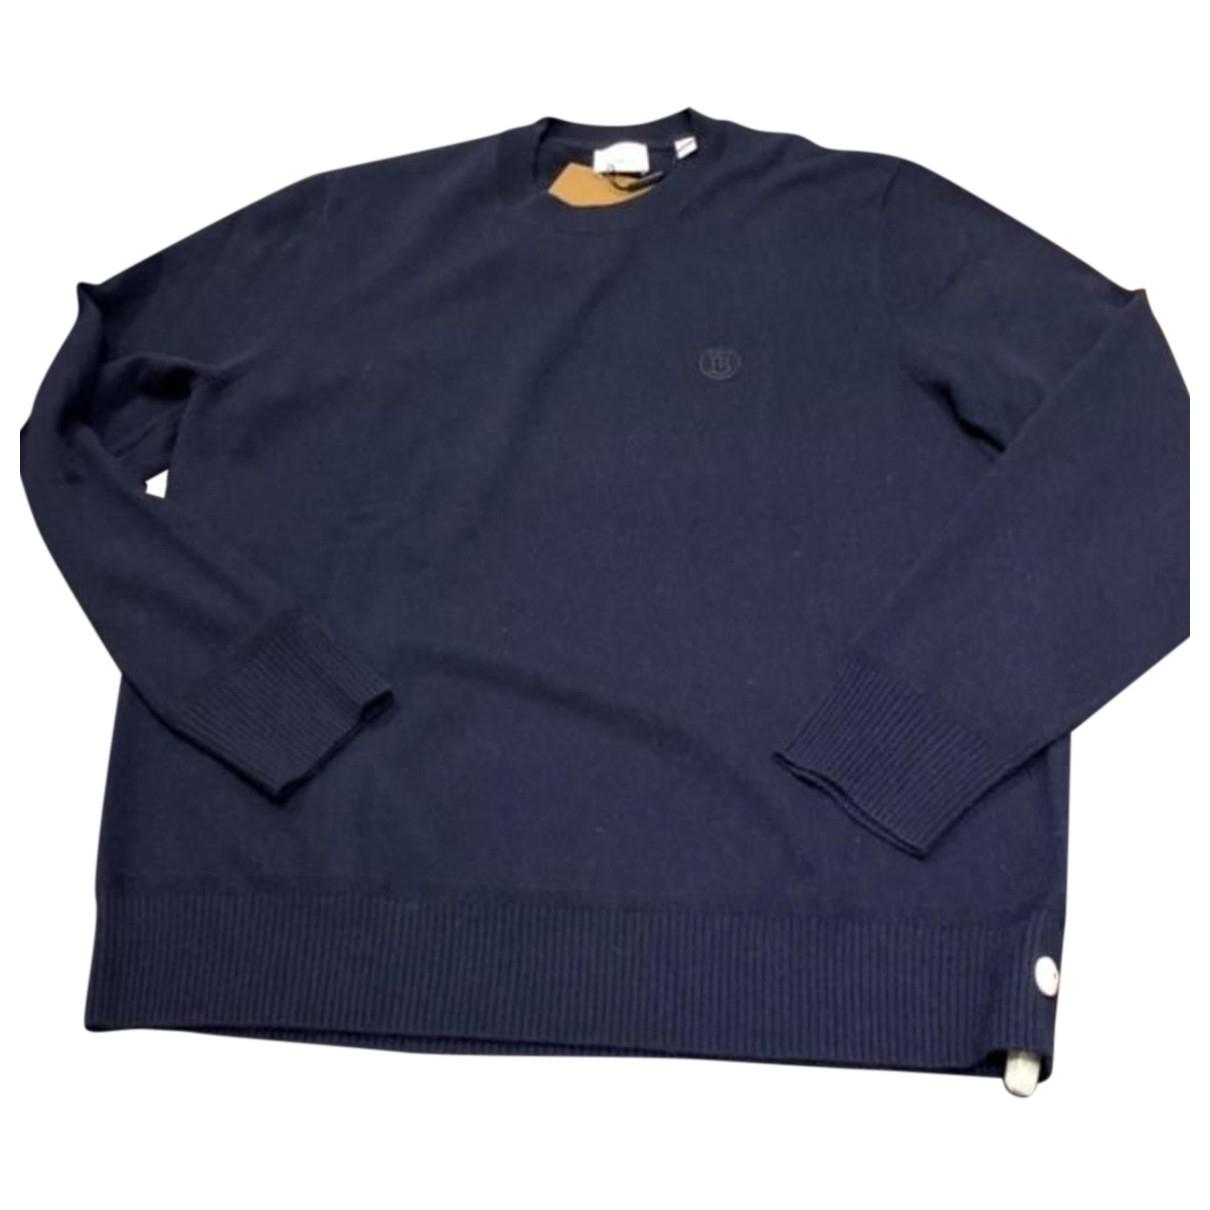 Burberry N Blue Cashmere Knitwear & Sweatshirts for Men L International